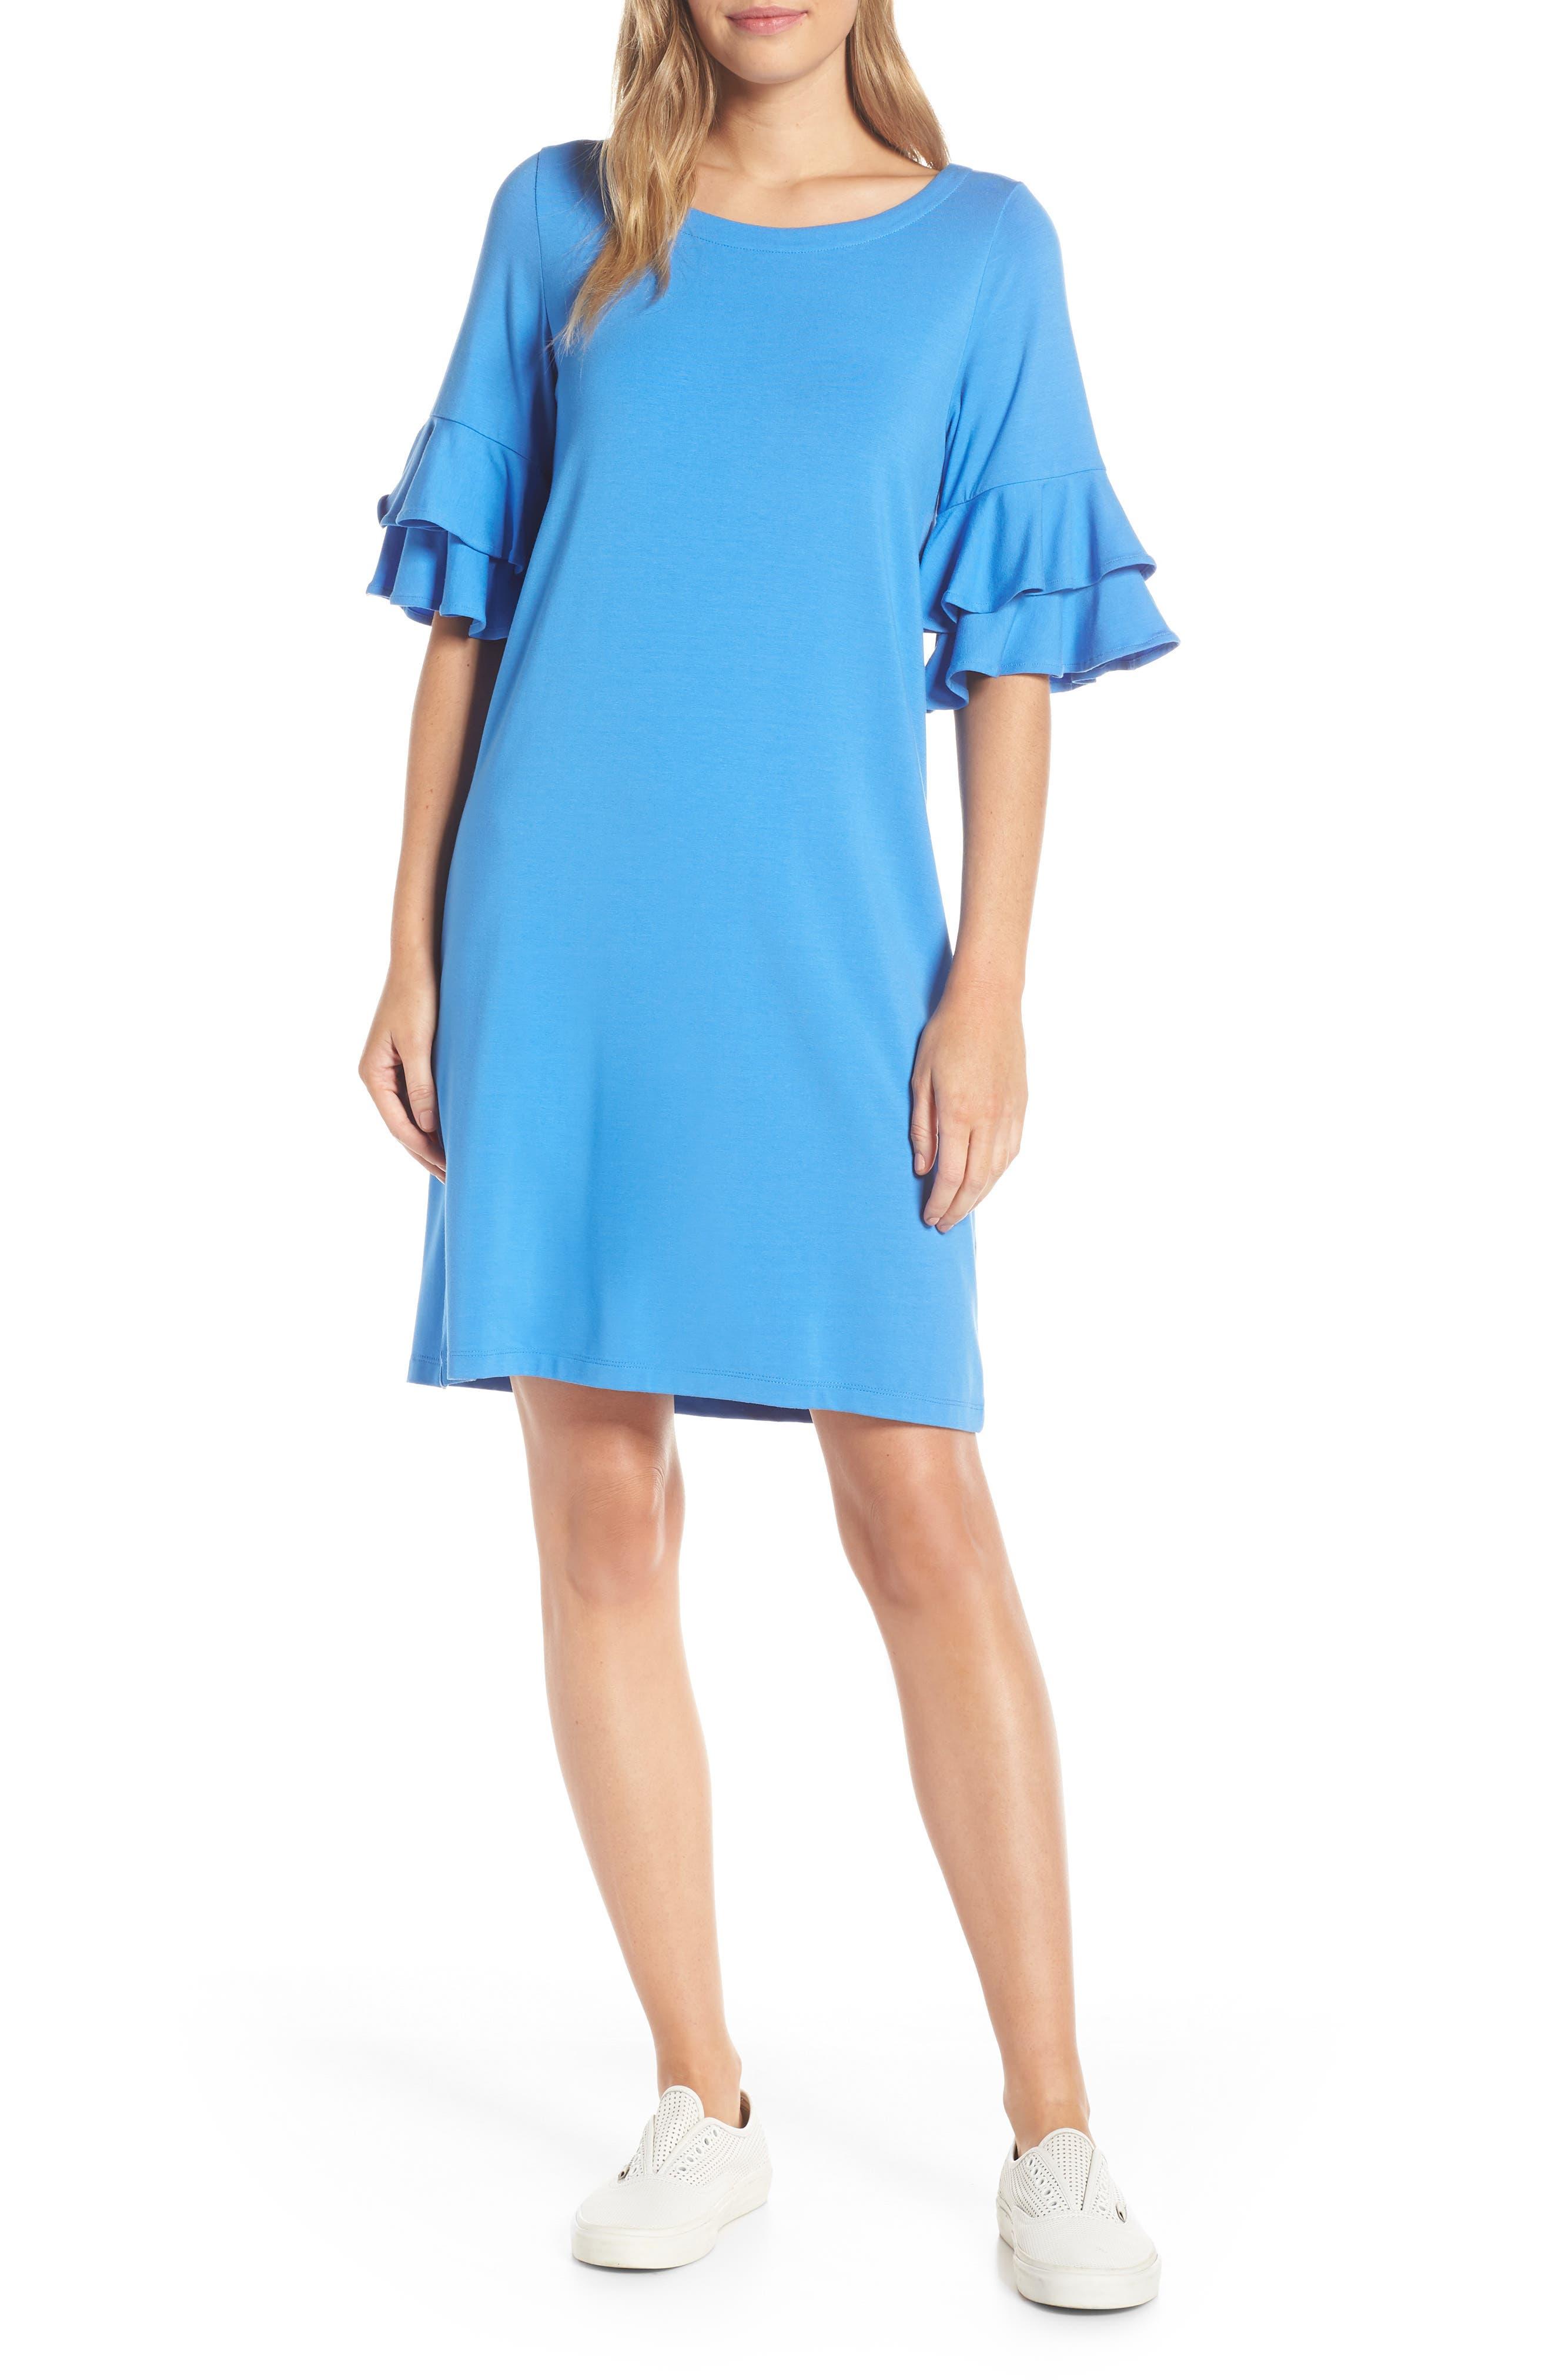 Lilly Pulitzer Lula Ruffle Sleeve Shift Dress, Blue